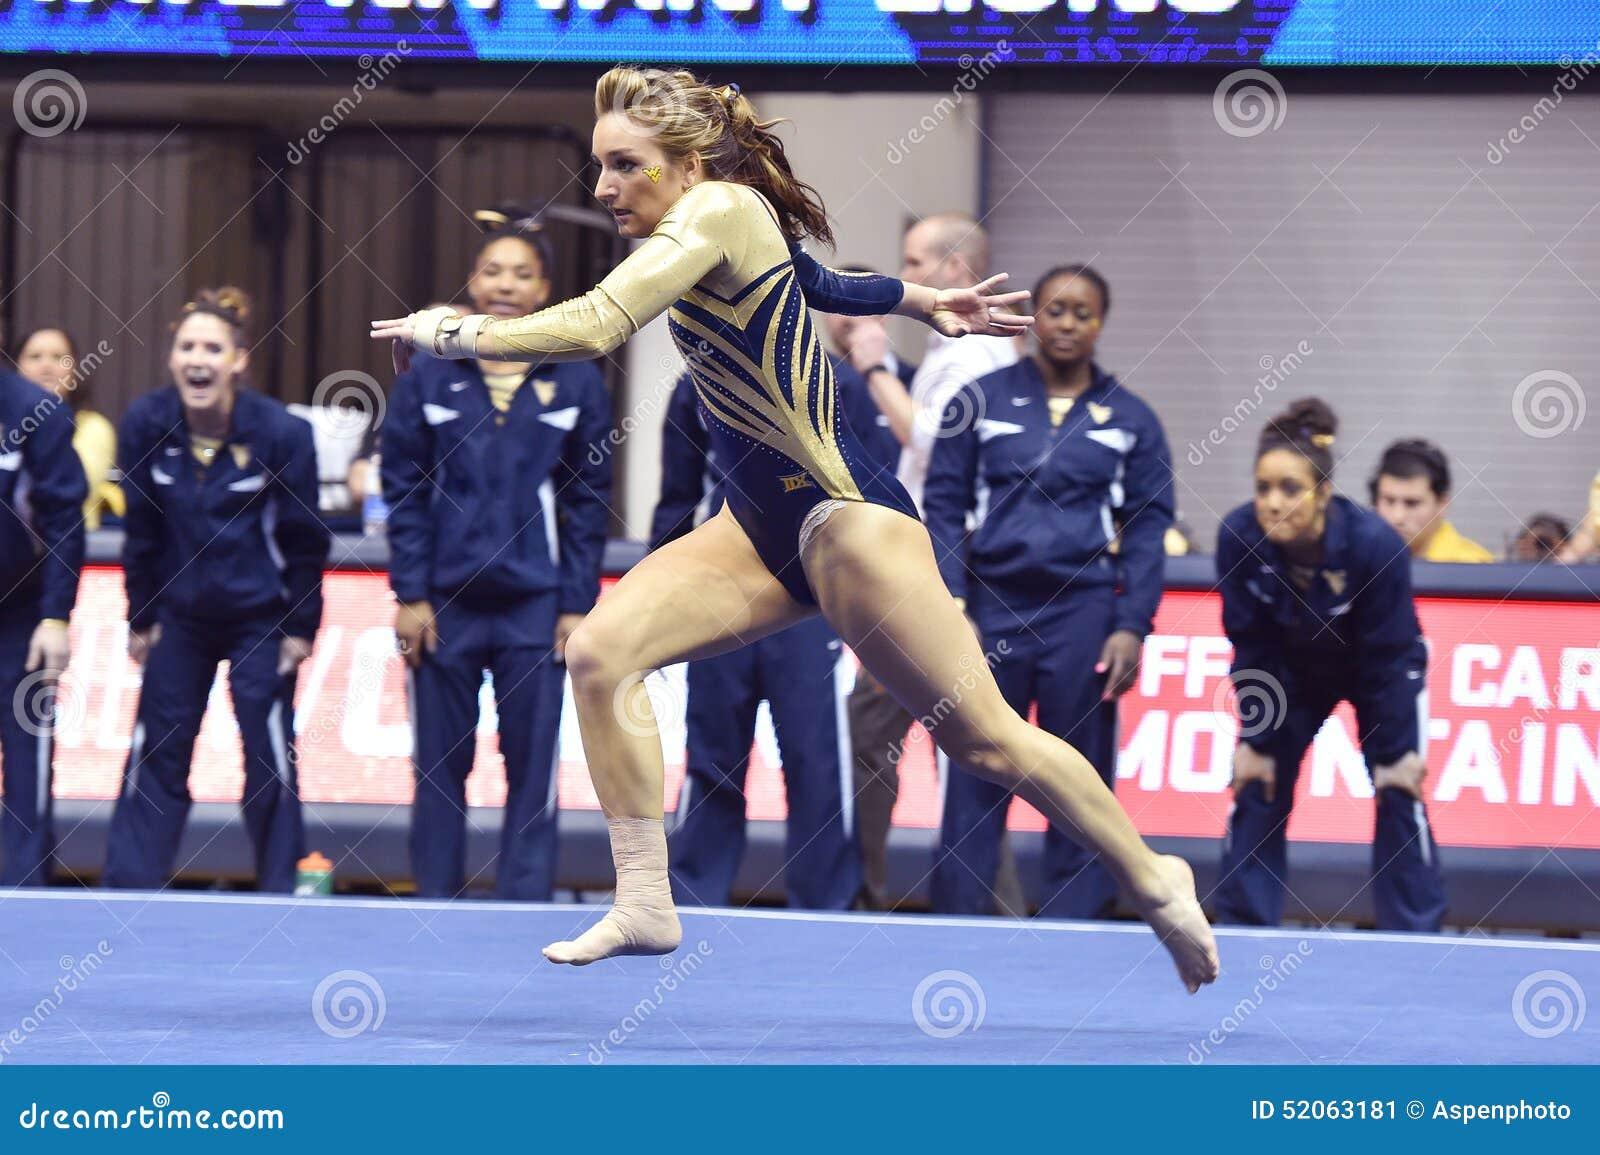 wv gymnastics state meet 2014